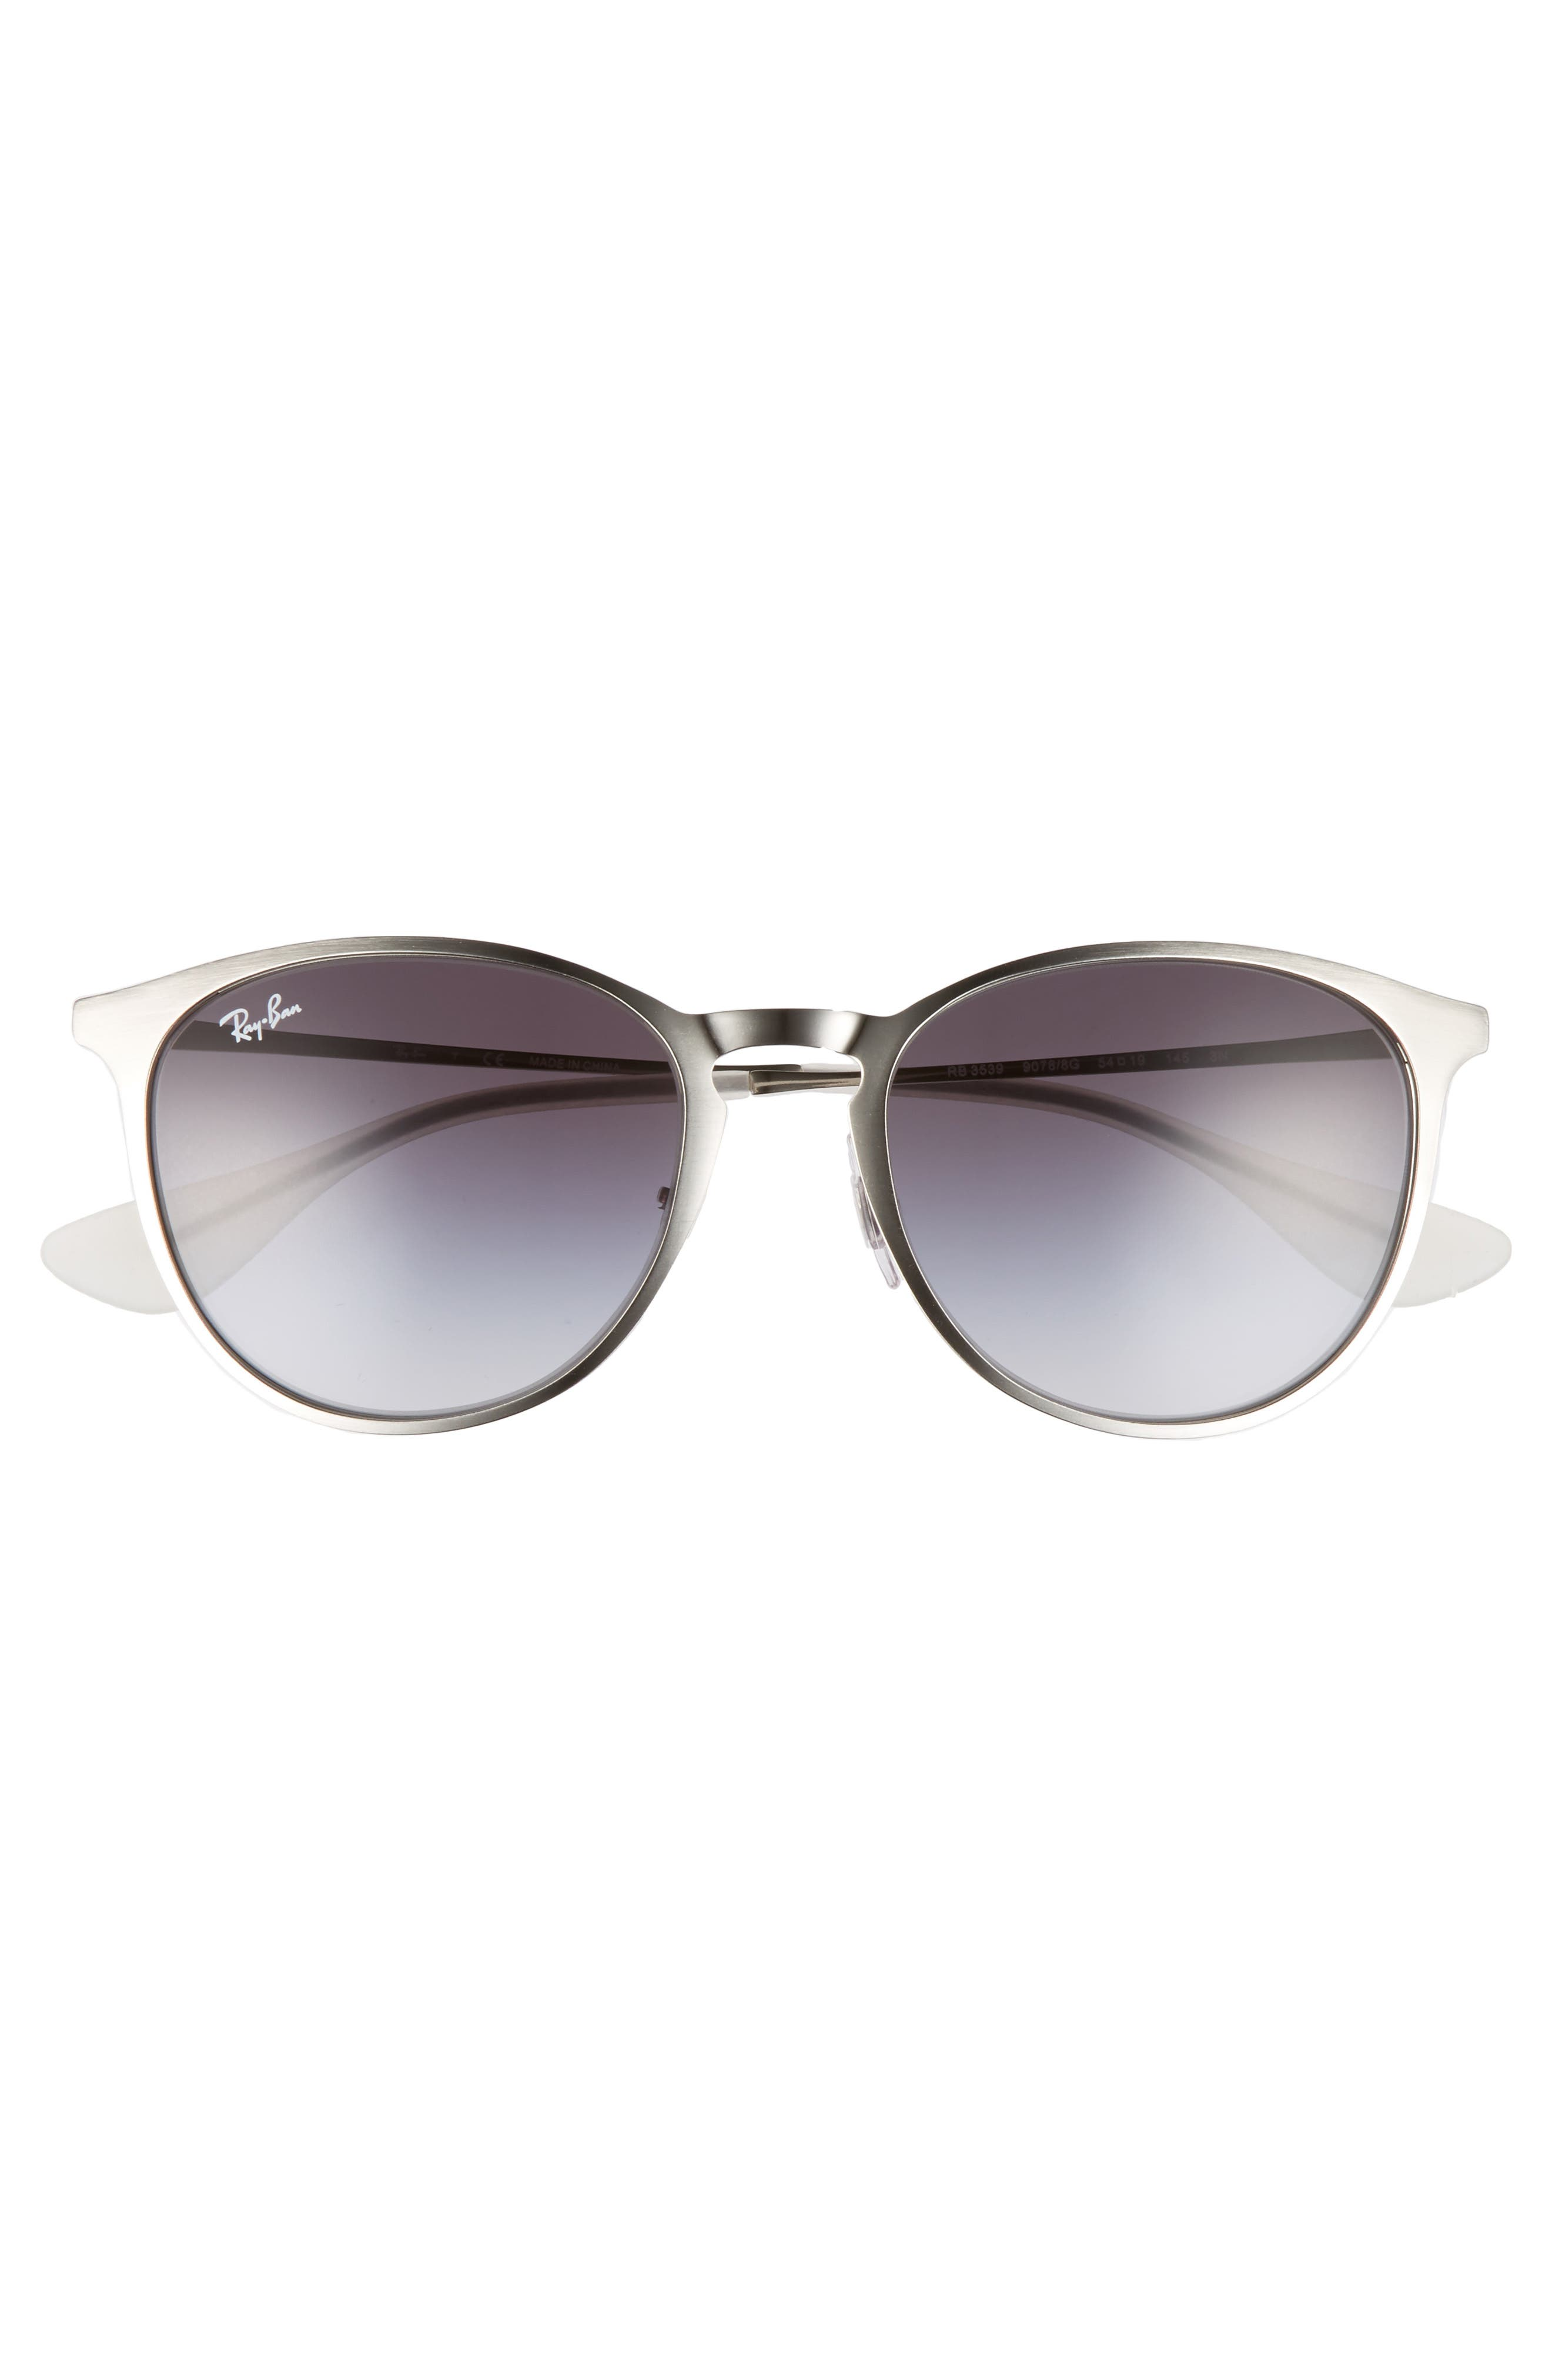 Erika 54mm Metal Sunglasses,                             Alternate thumbnail 2, color,                             LITE SILVER